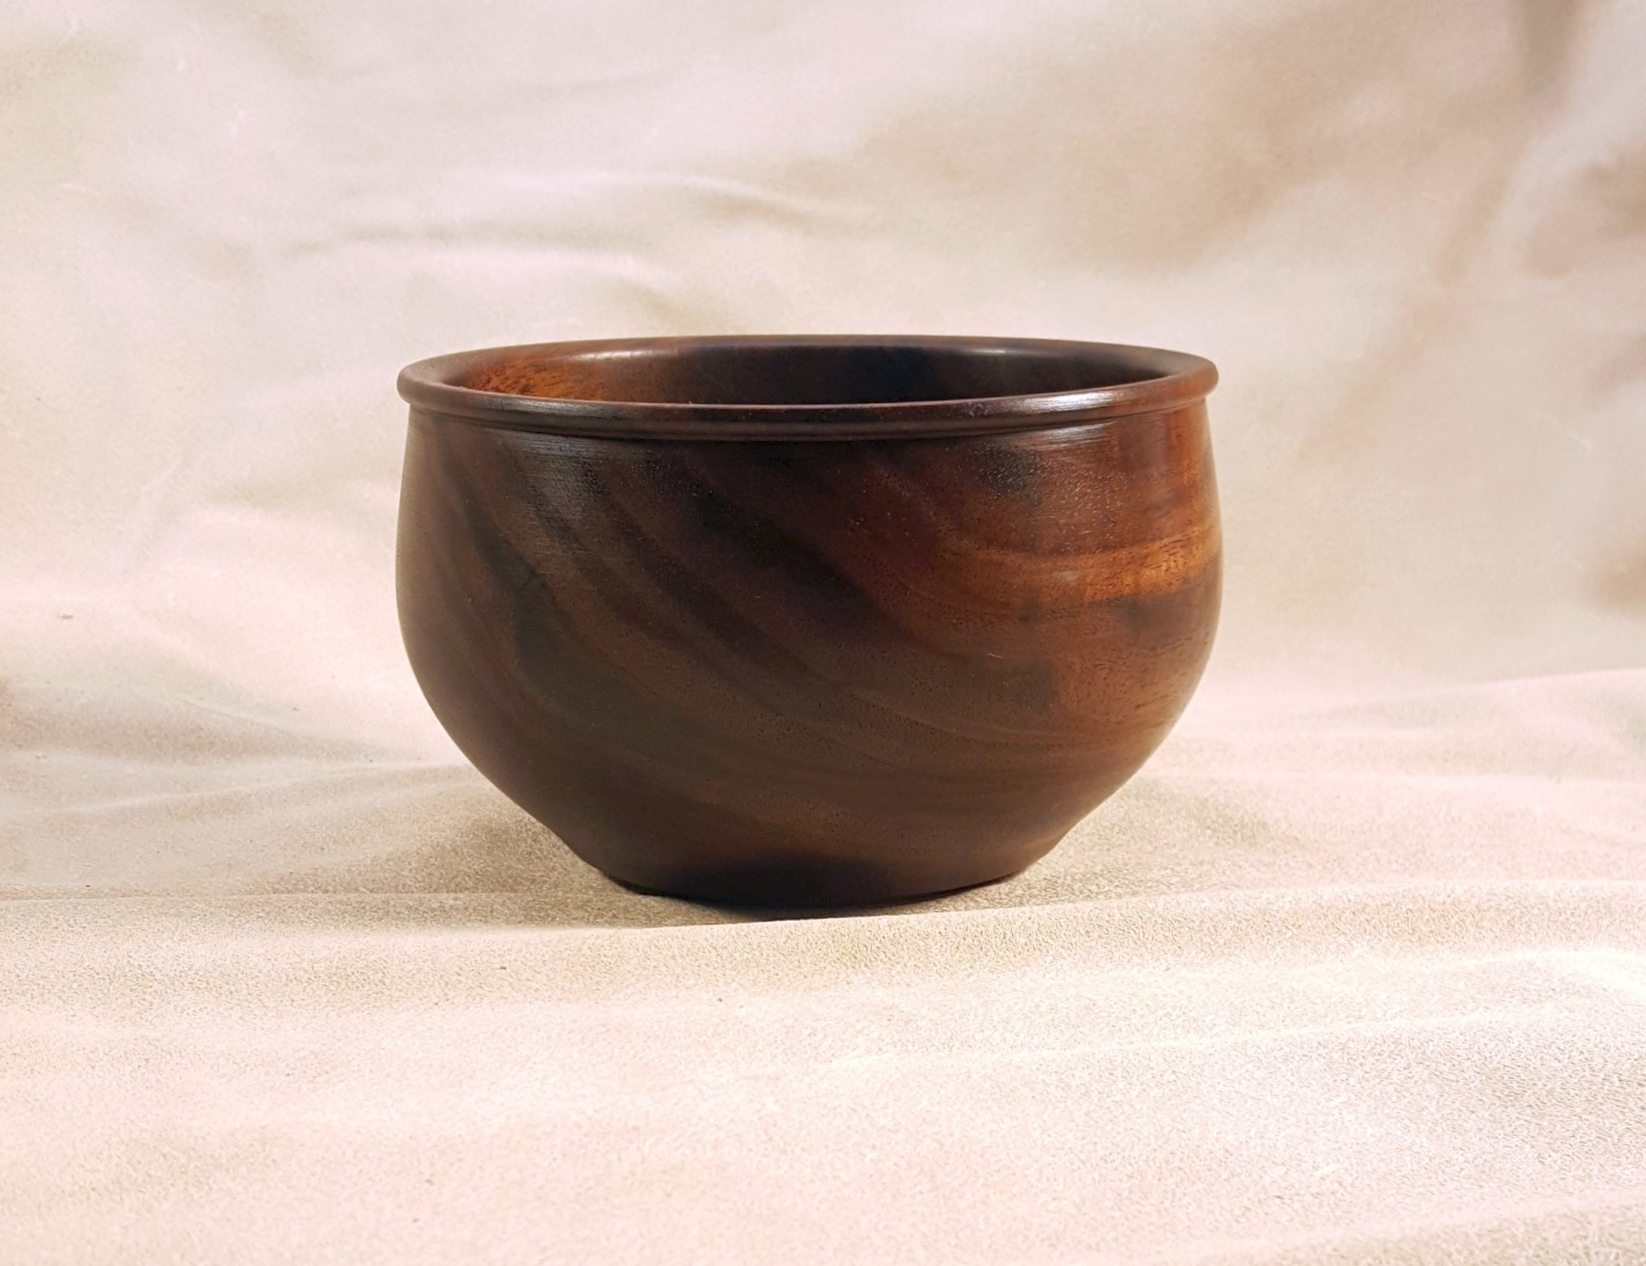 Dublin Viking Bowl in Black Walnut